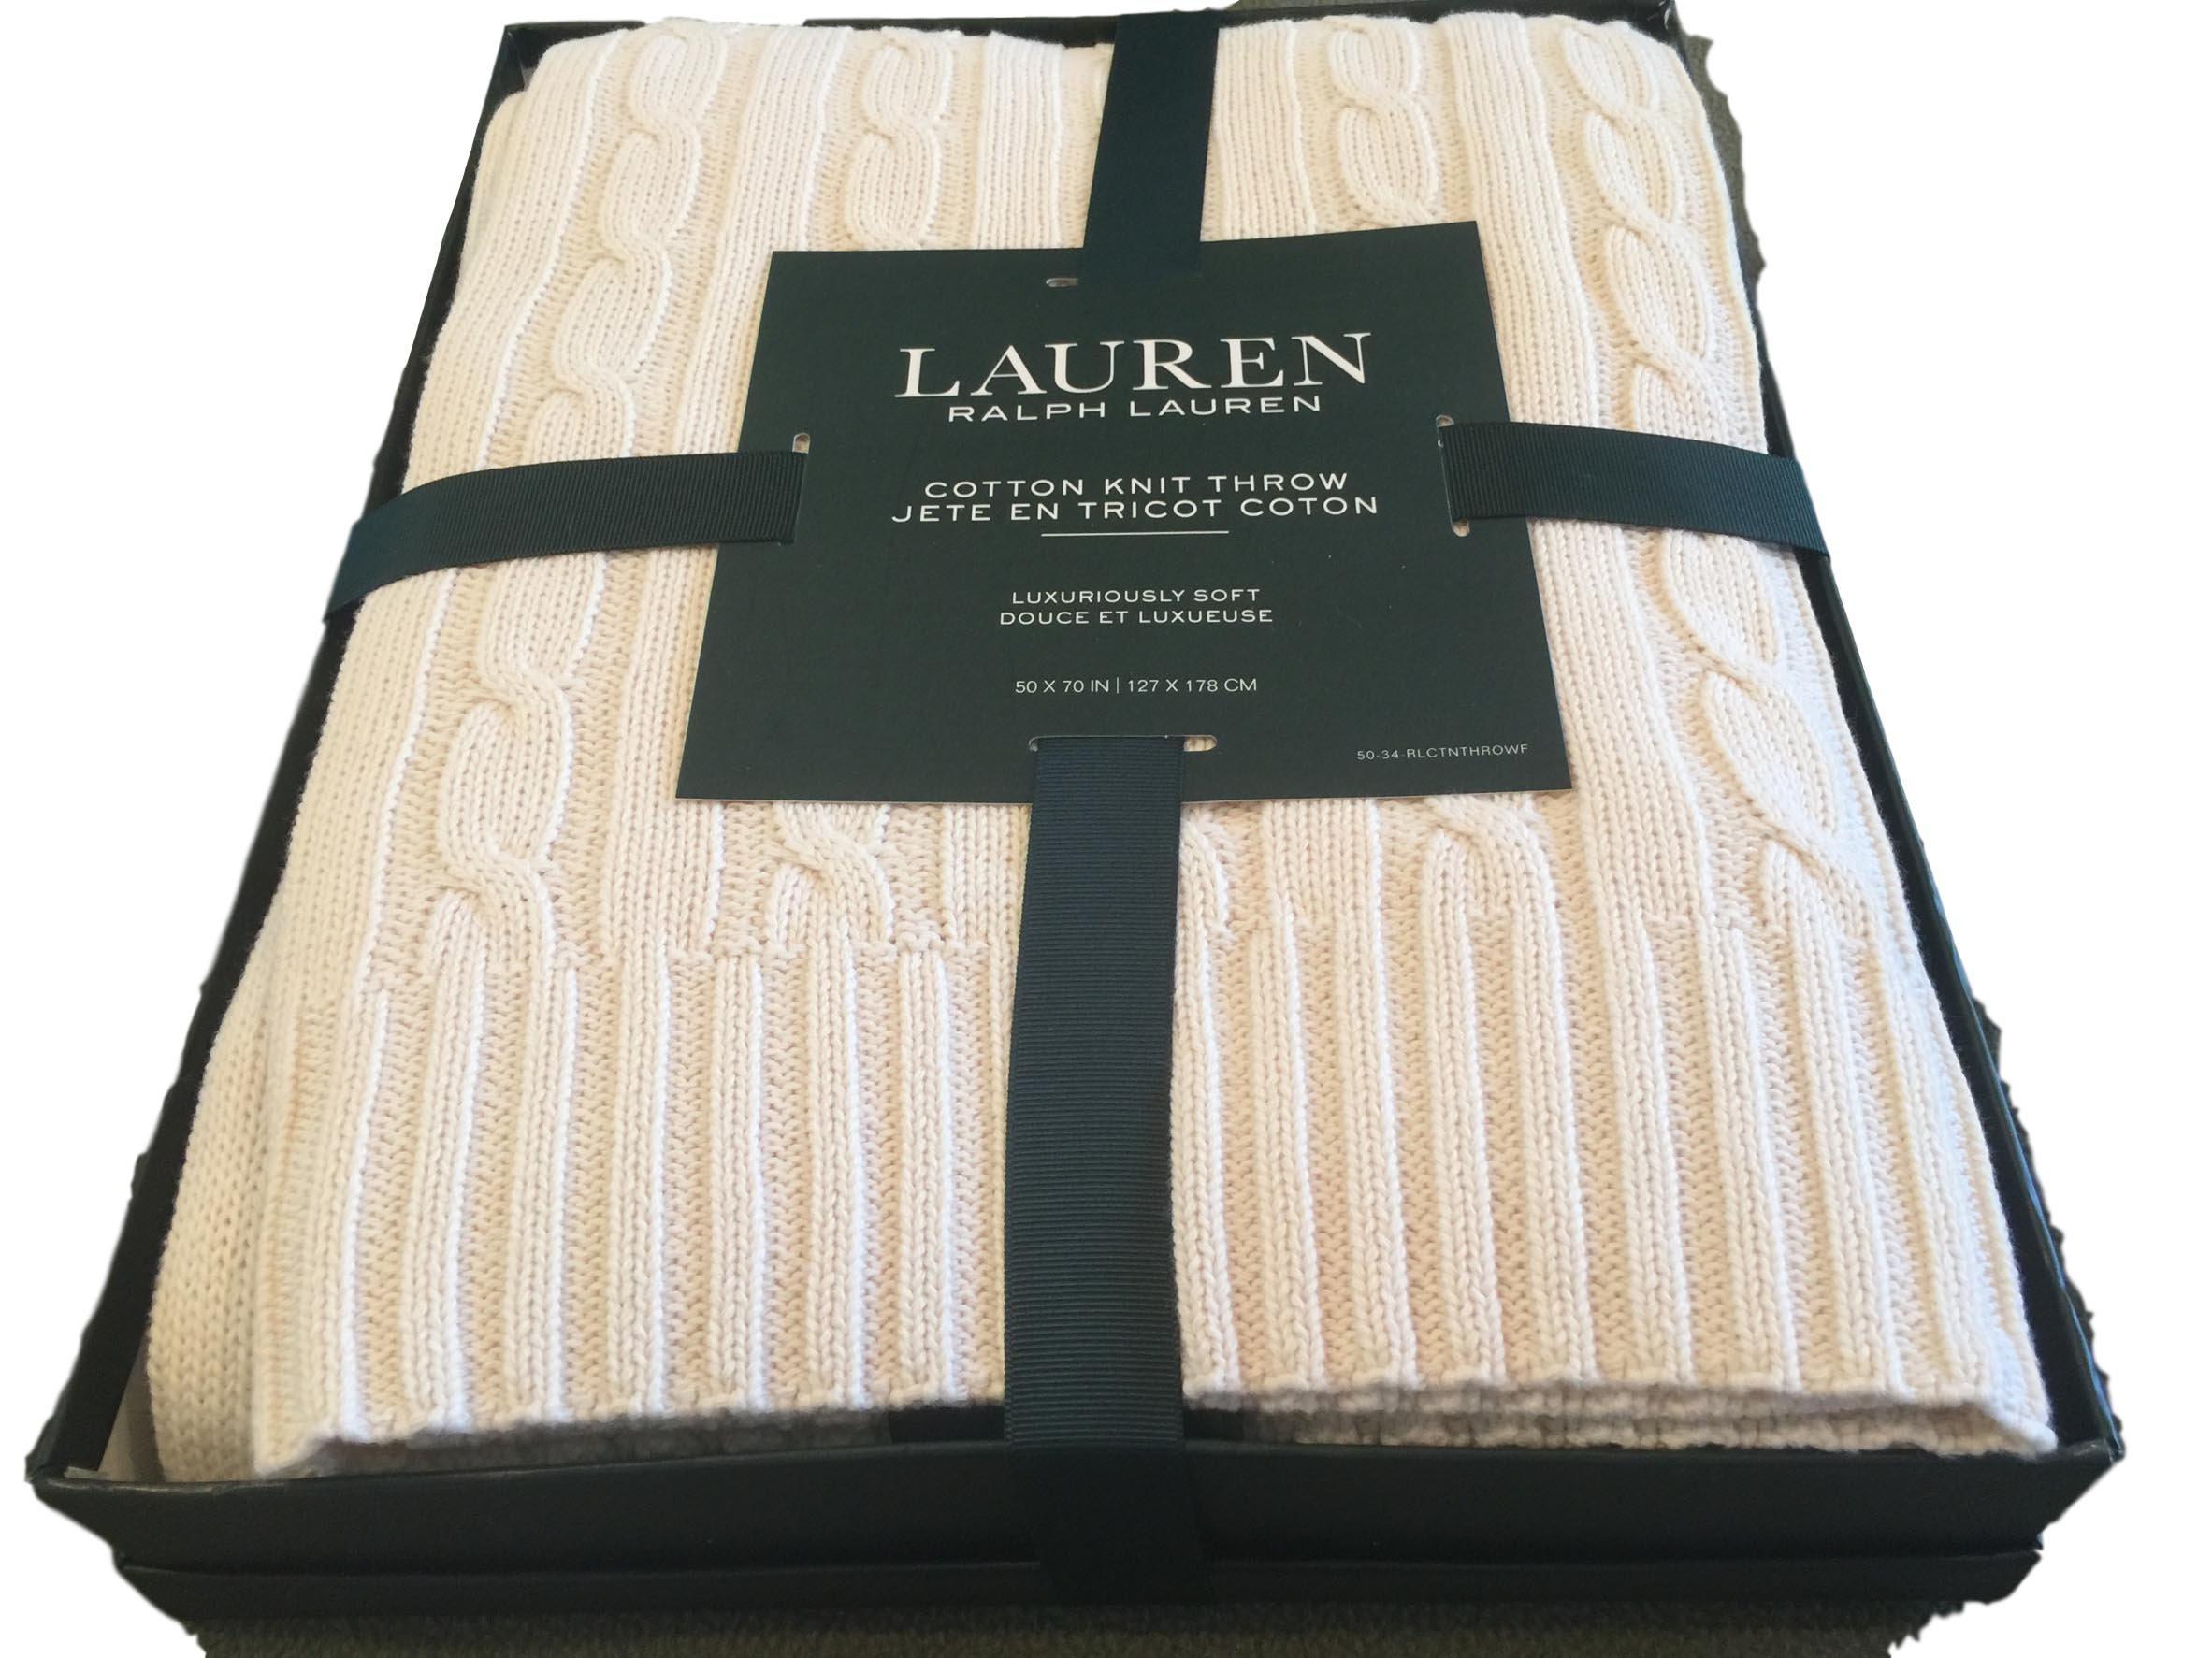 Ralph Lauren Cotton Throw Blanket 50 x 70 Cable Knit Cream in RL Gift Box